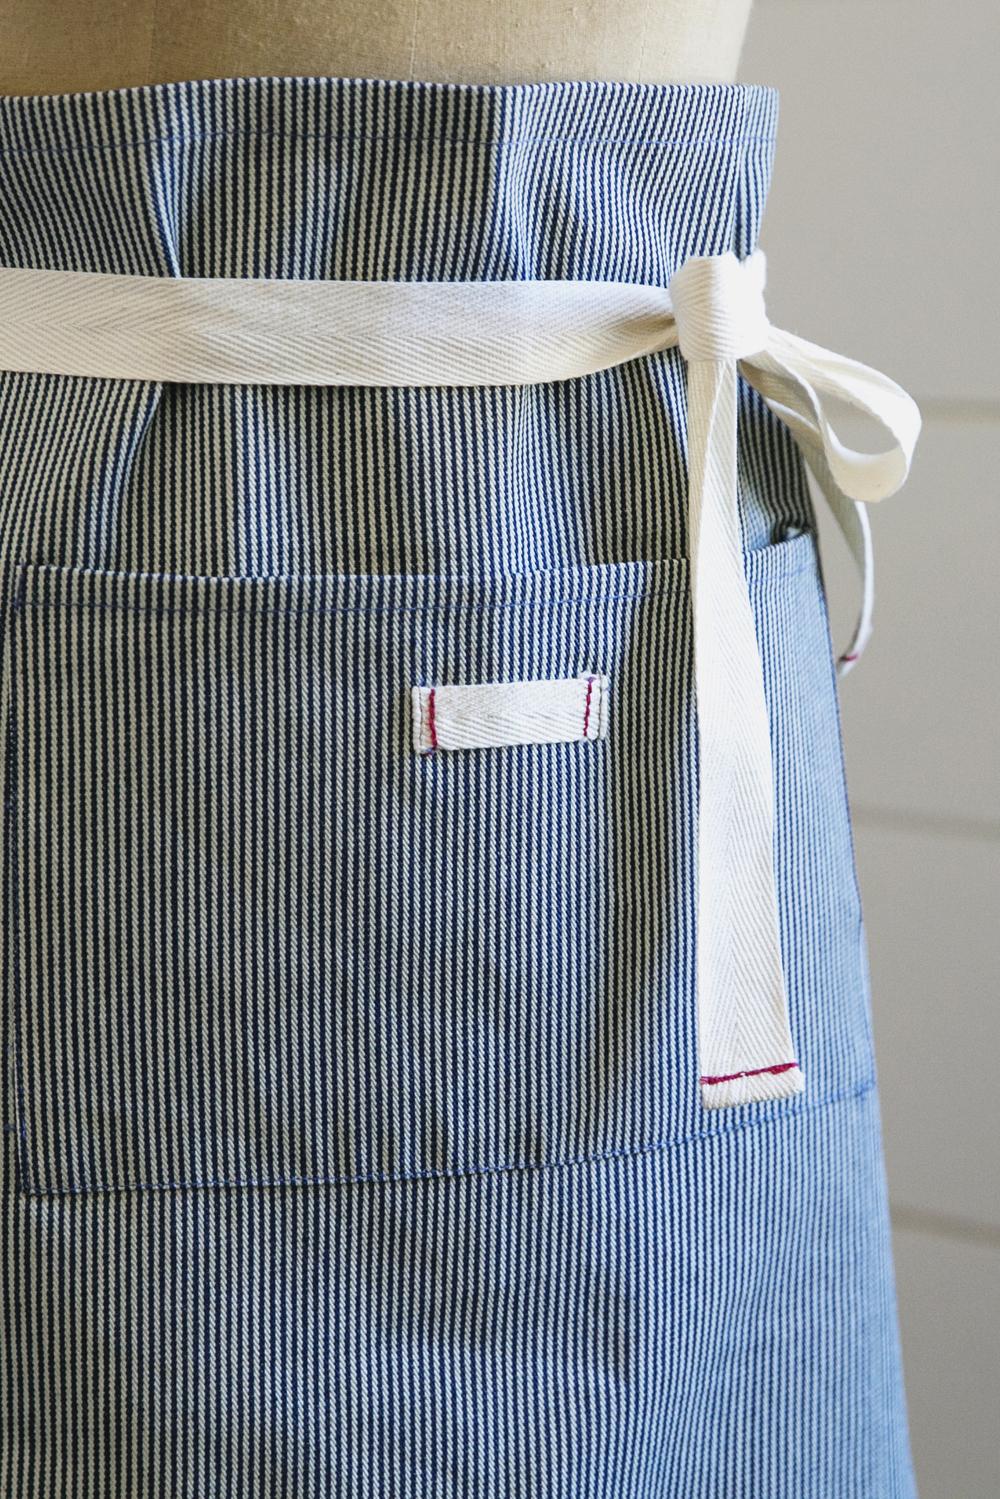 striped cafe apron